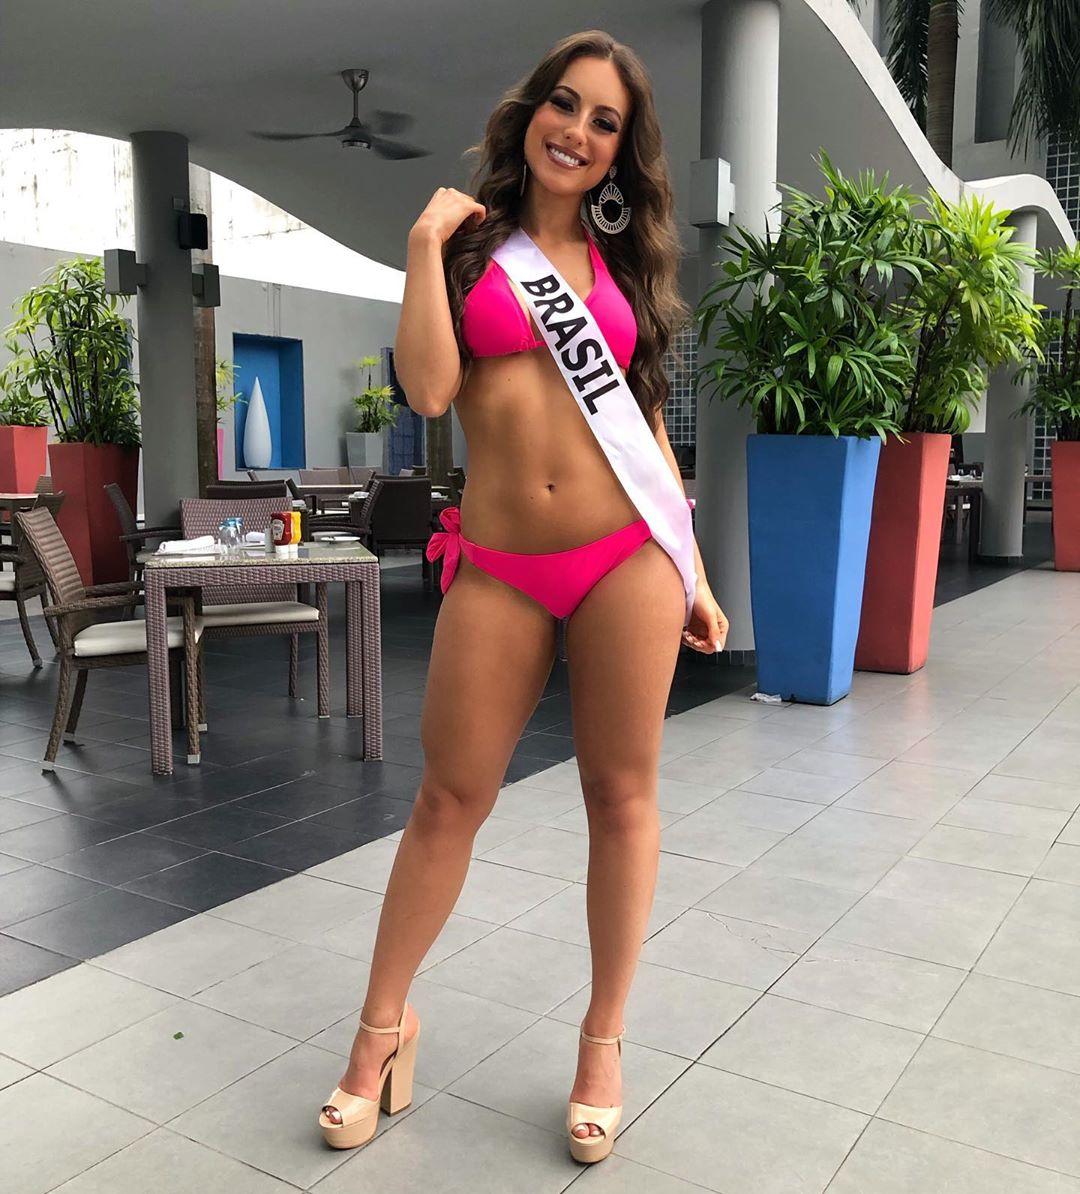 cristine boff sartor, segunda finalista de miss latinoamerica 2019. - Página 7 68994910